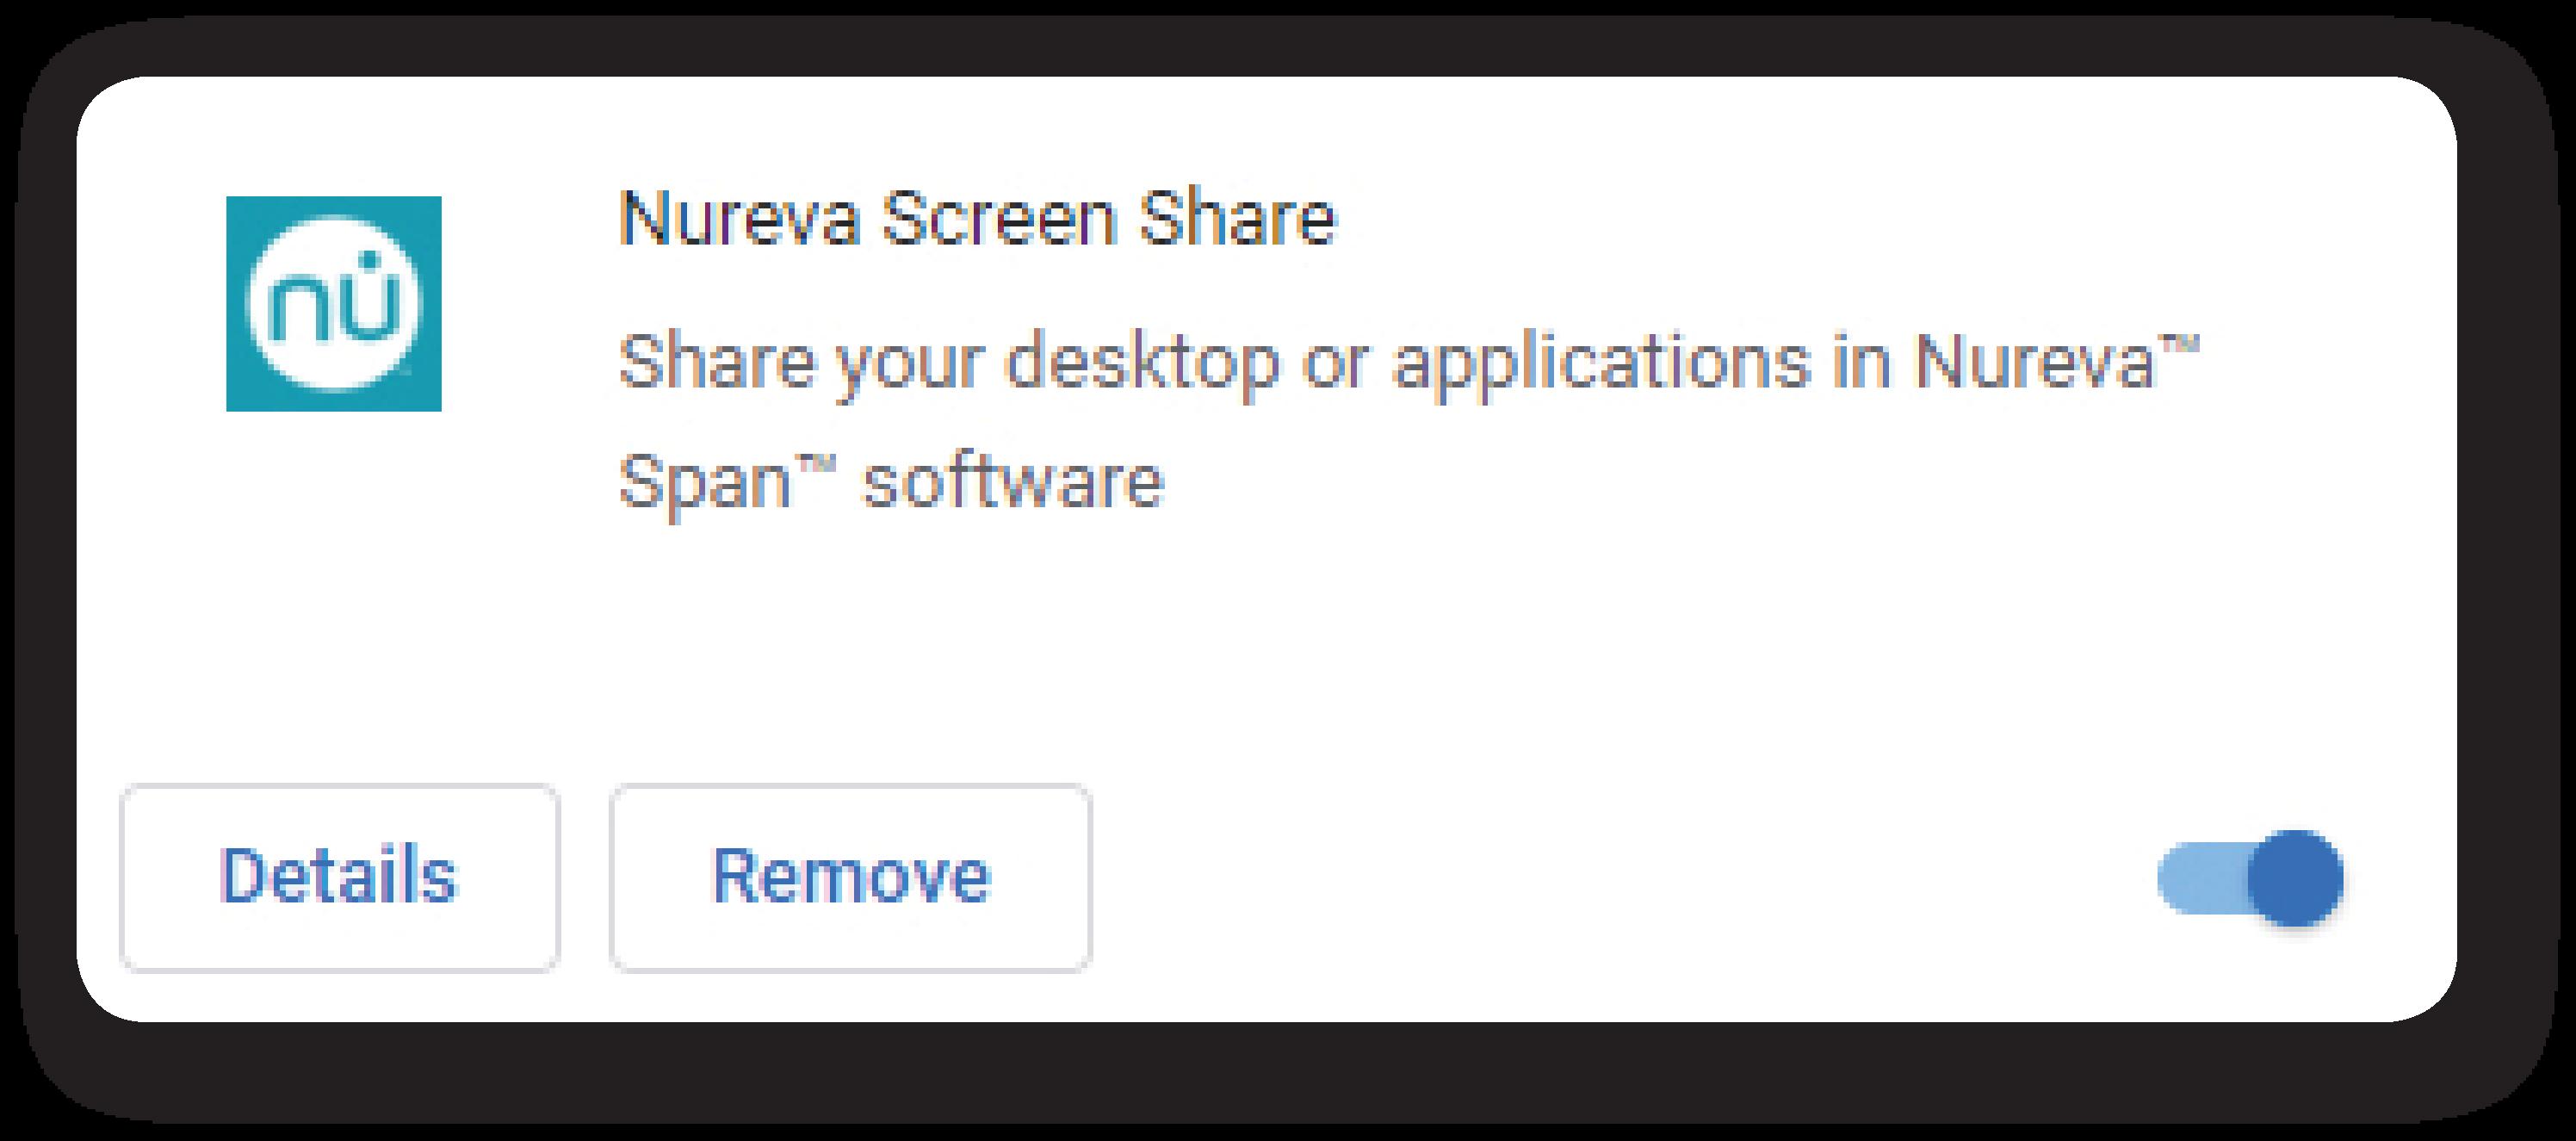 Nureva — Screen share troubleshooting